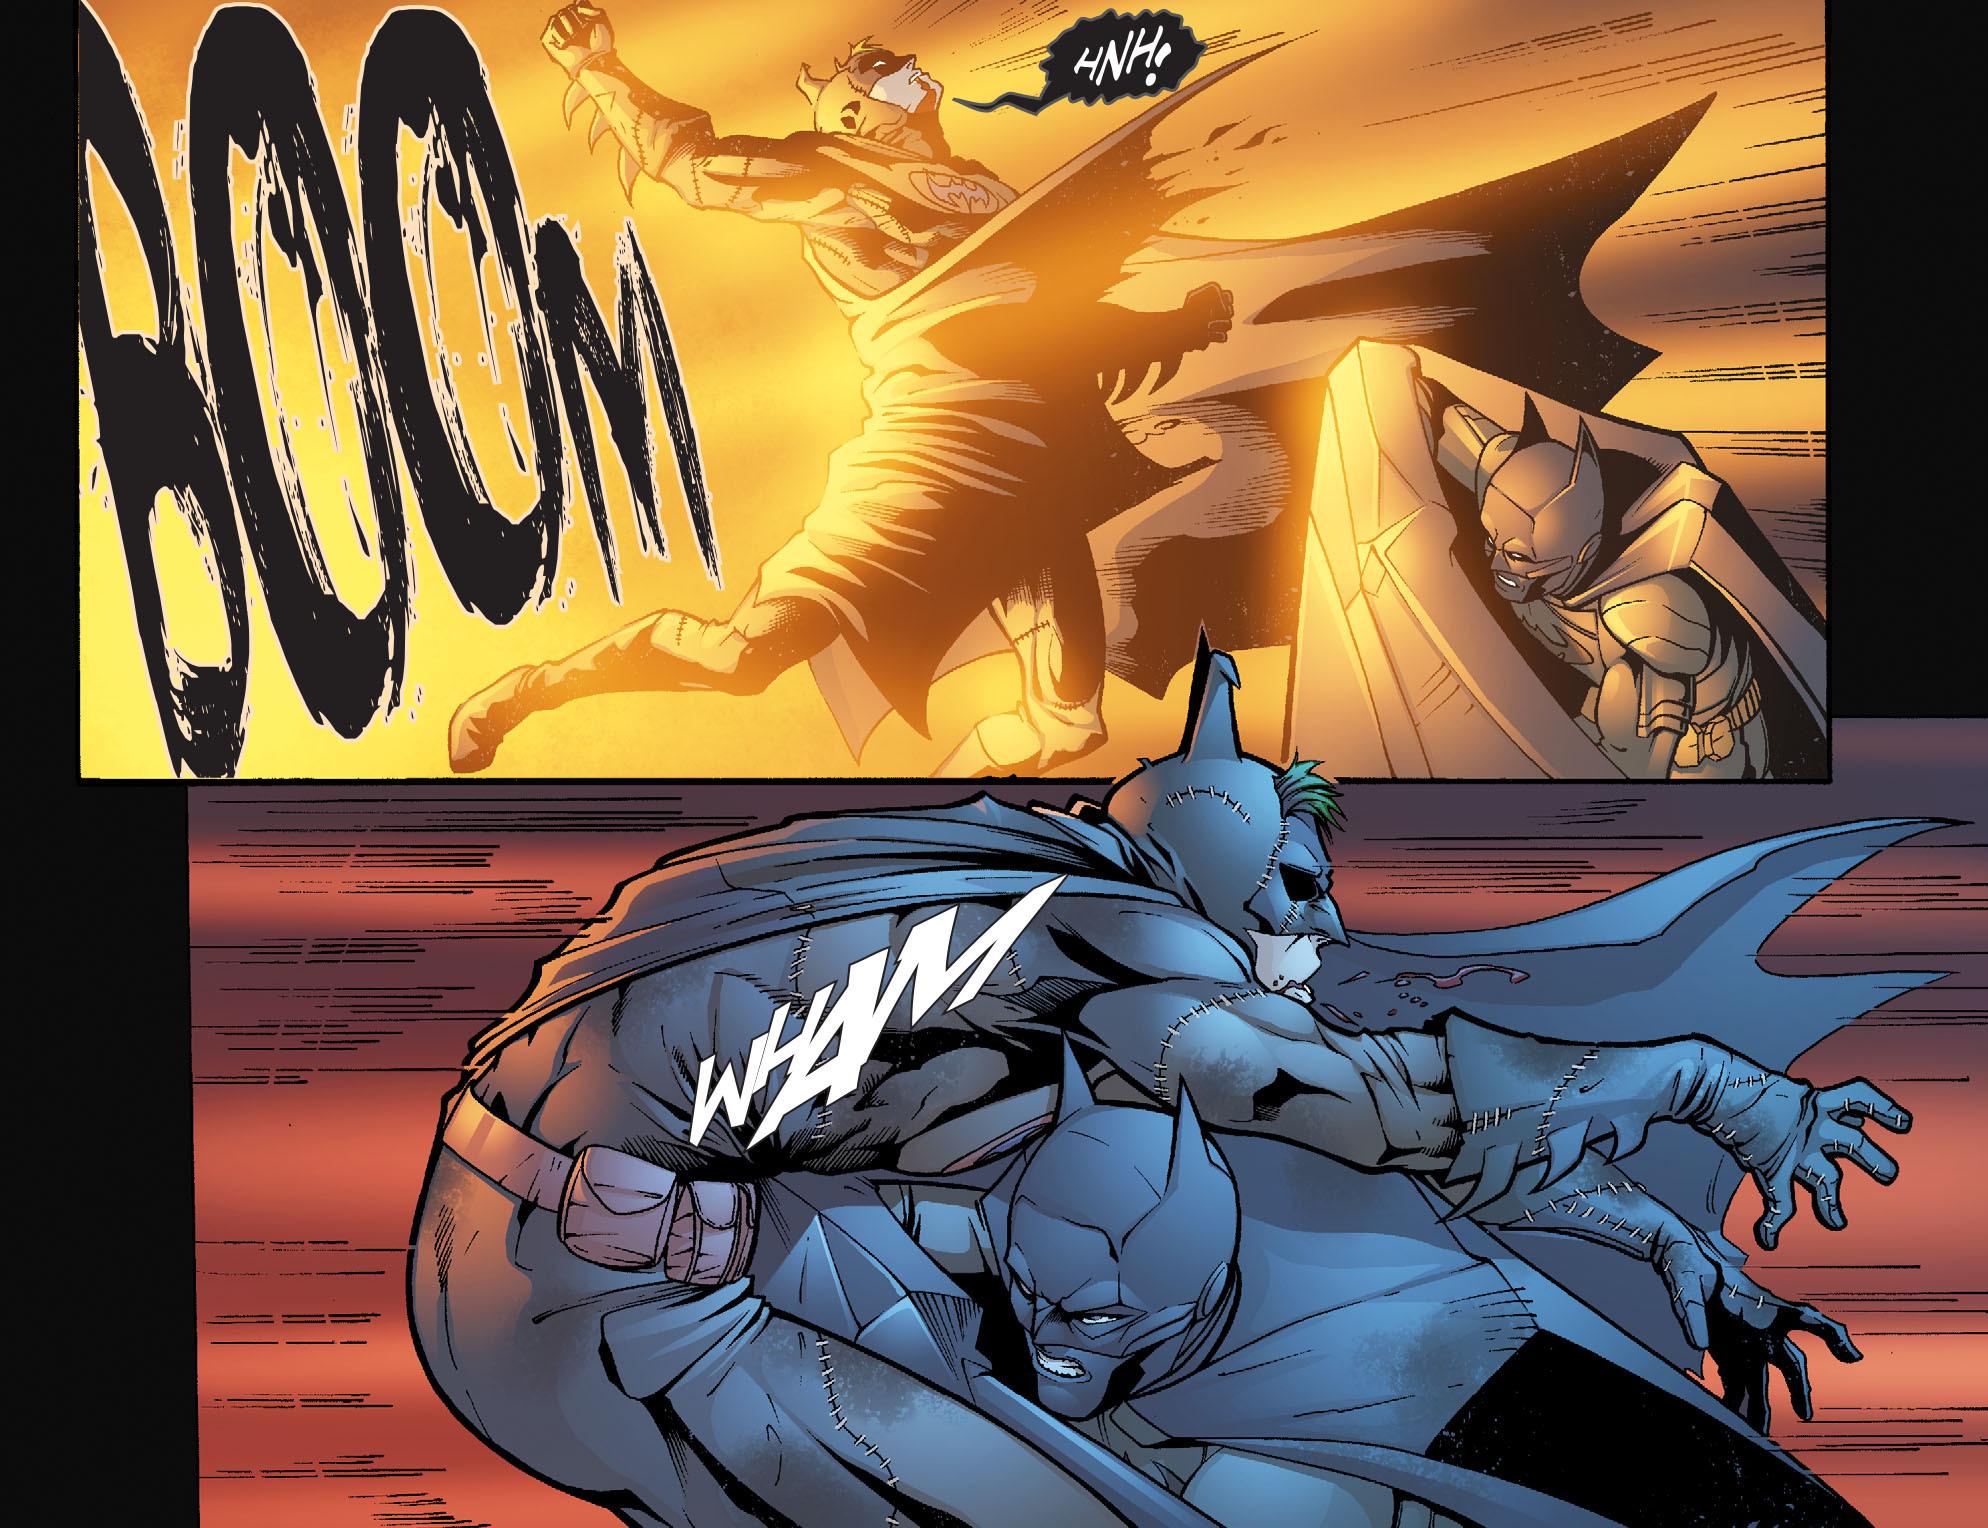 Read online Smallville: Alien comic -  Issue #11 - 6